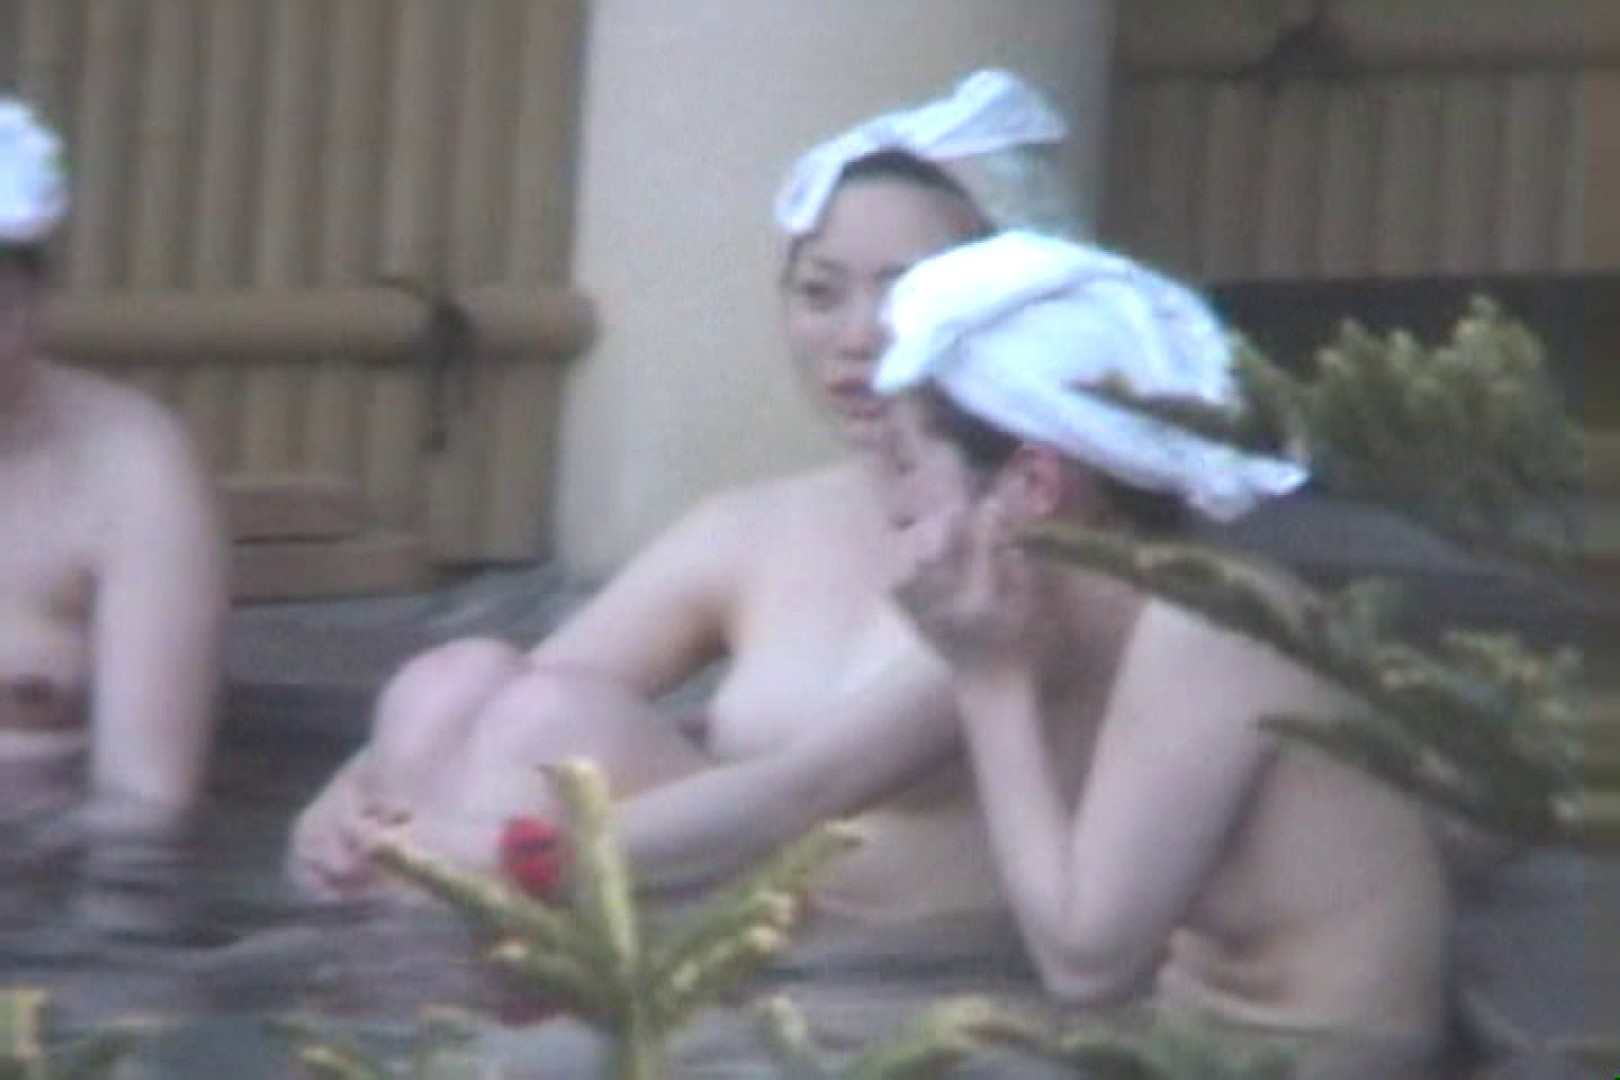 Aquaな露天風呂Vol.86【VIP限定】 OLのエロ生活 オマンコ無修正動画無料 96連発 44